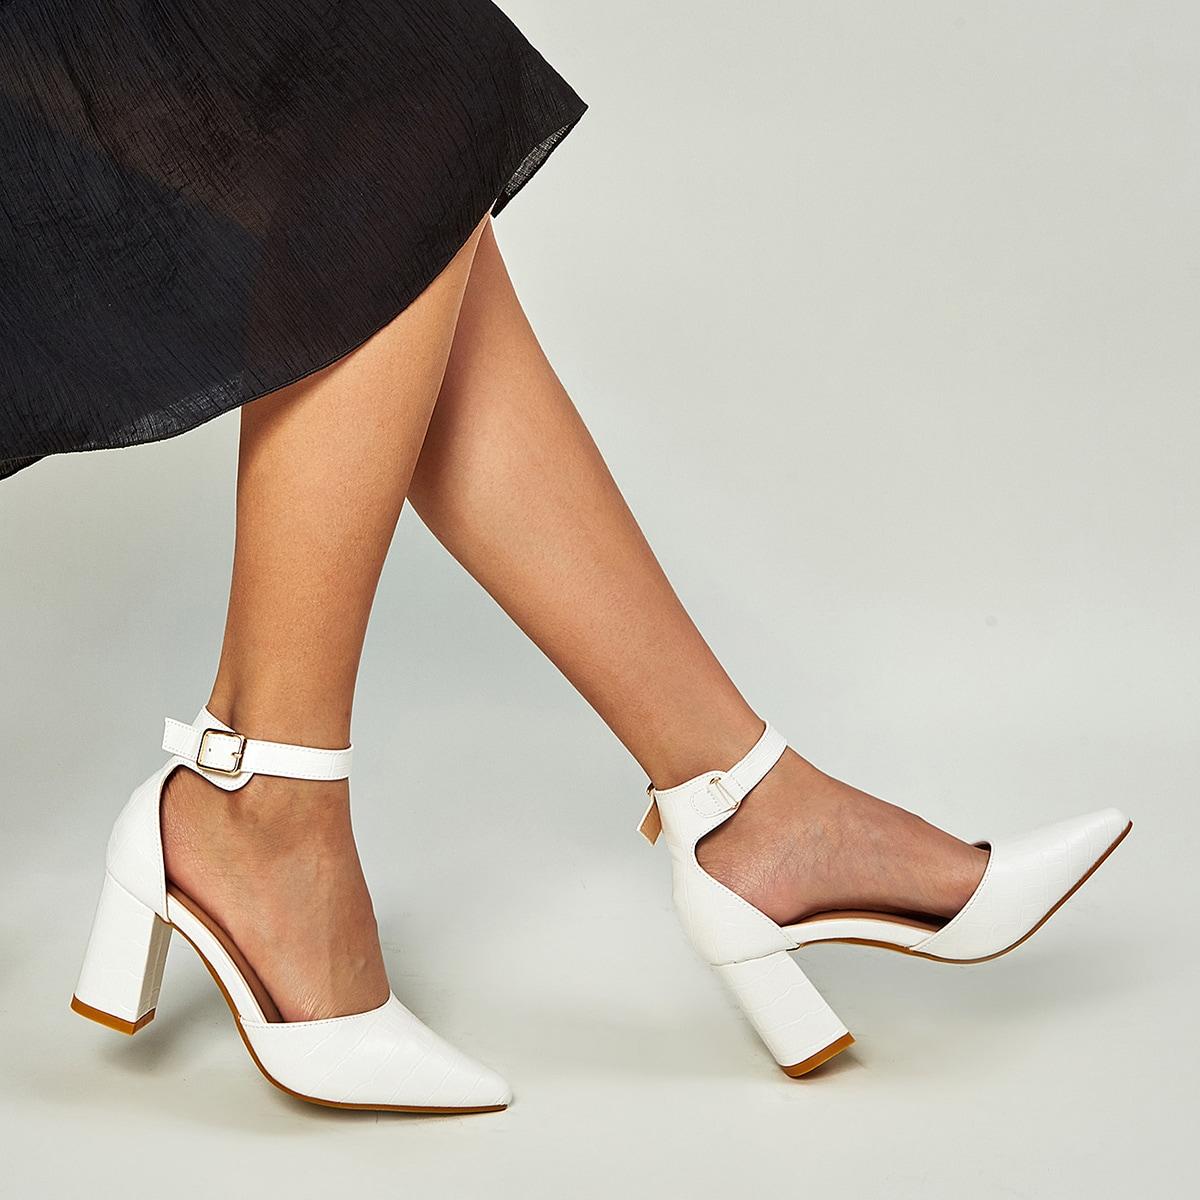 Туфли на среднем каблуке с крокодиловым узором